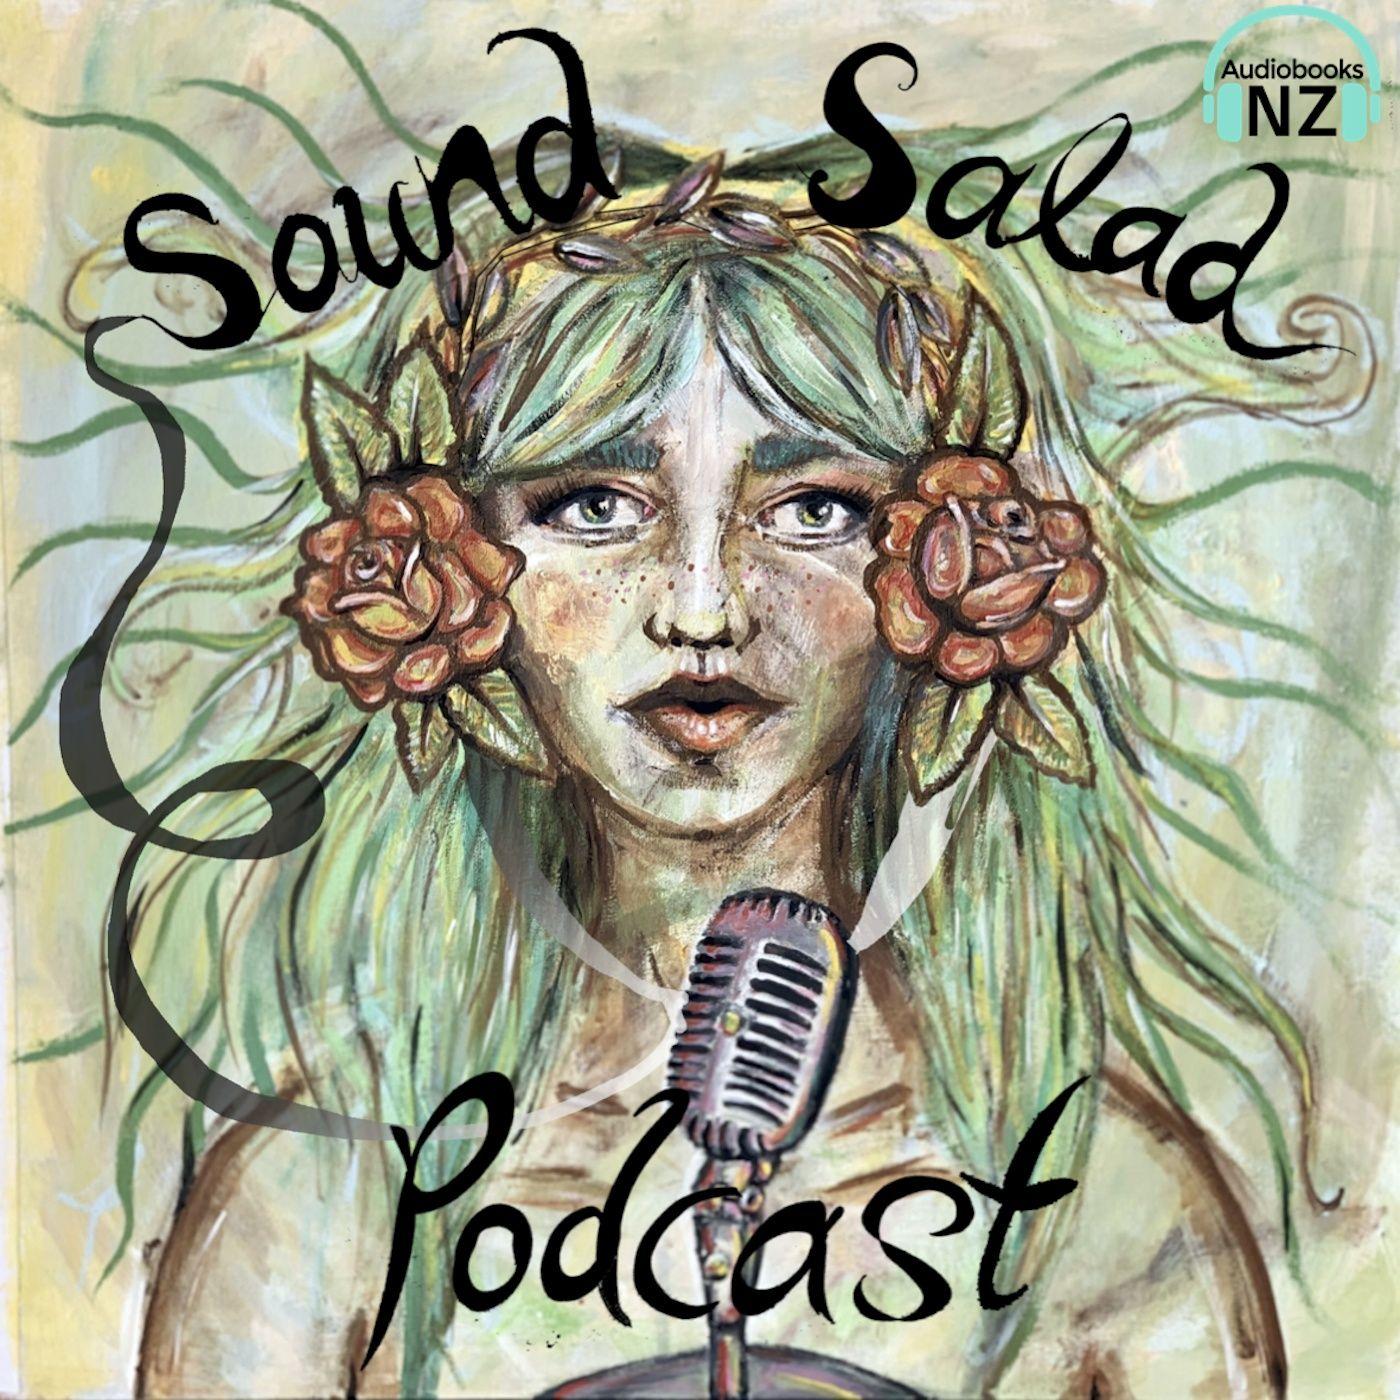 Sound Salad Podcast's artwork